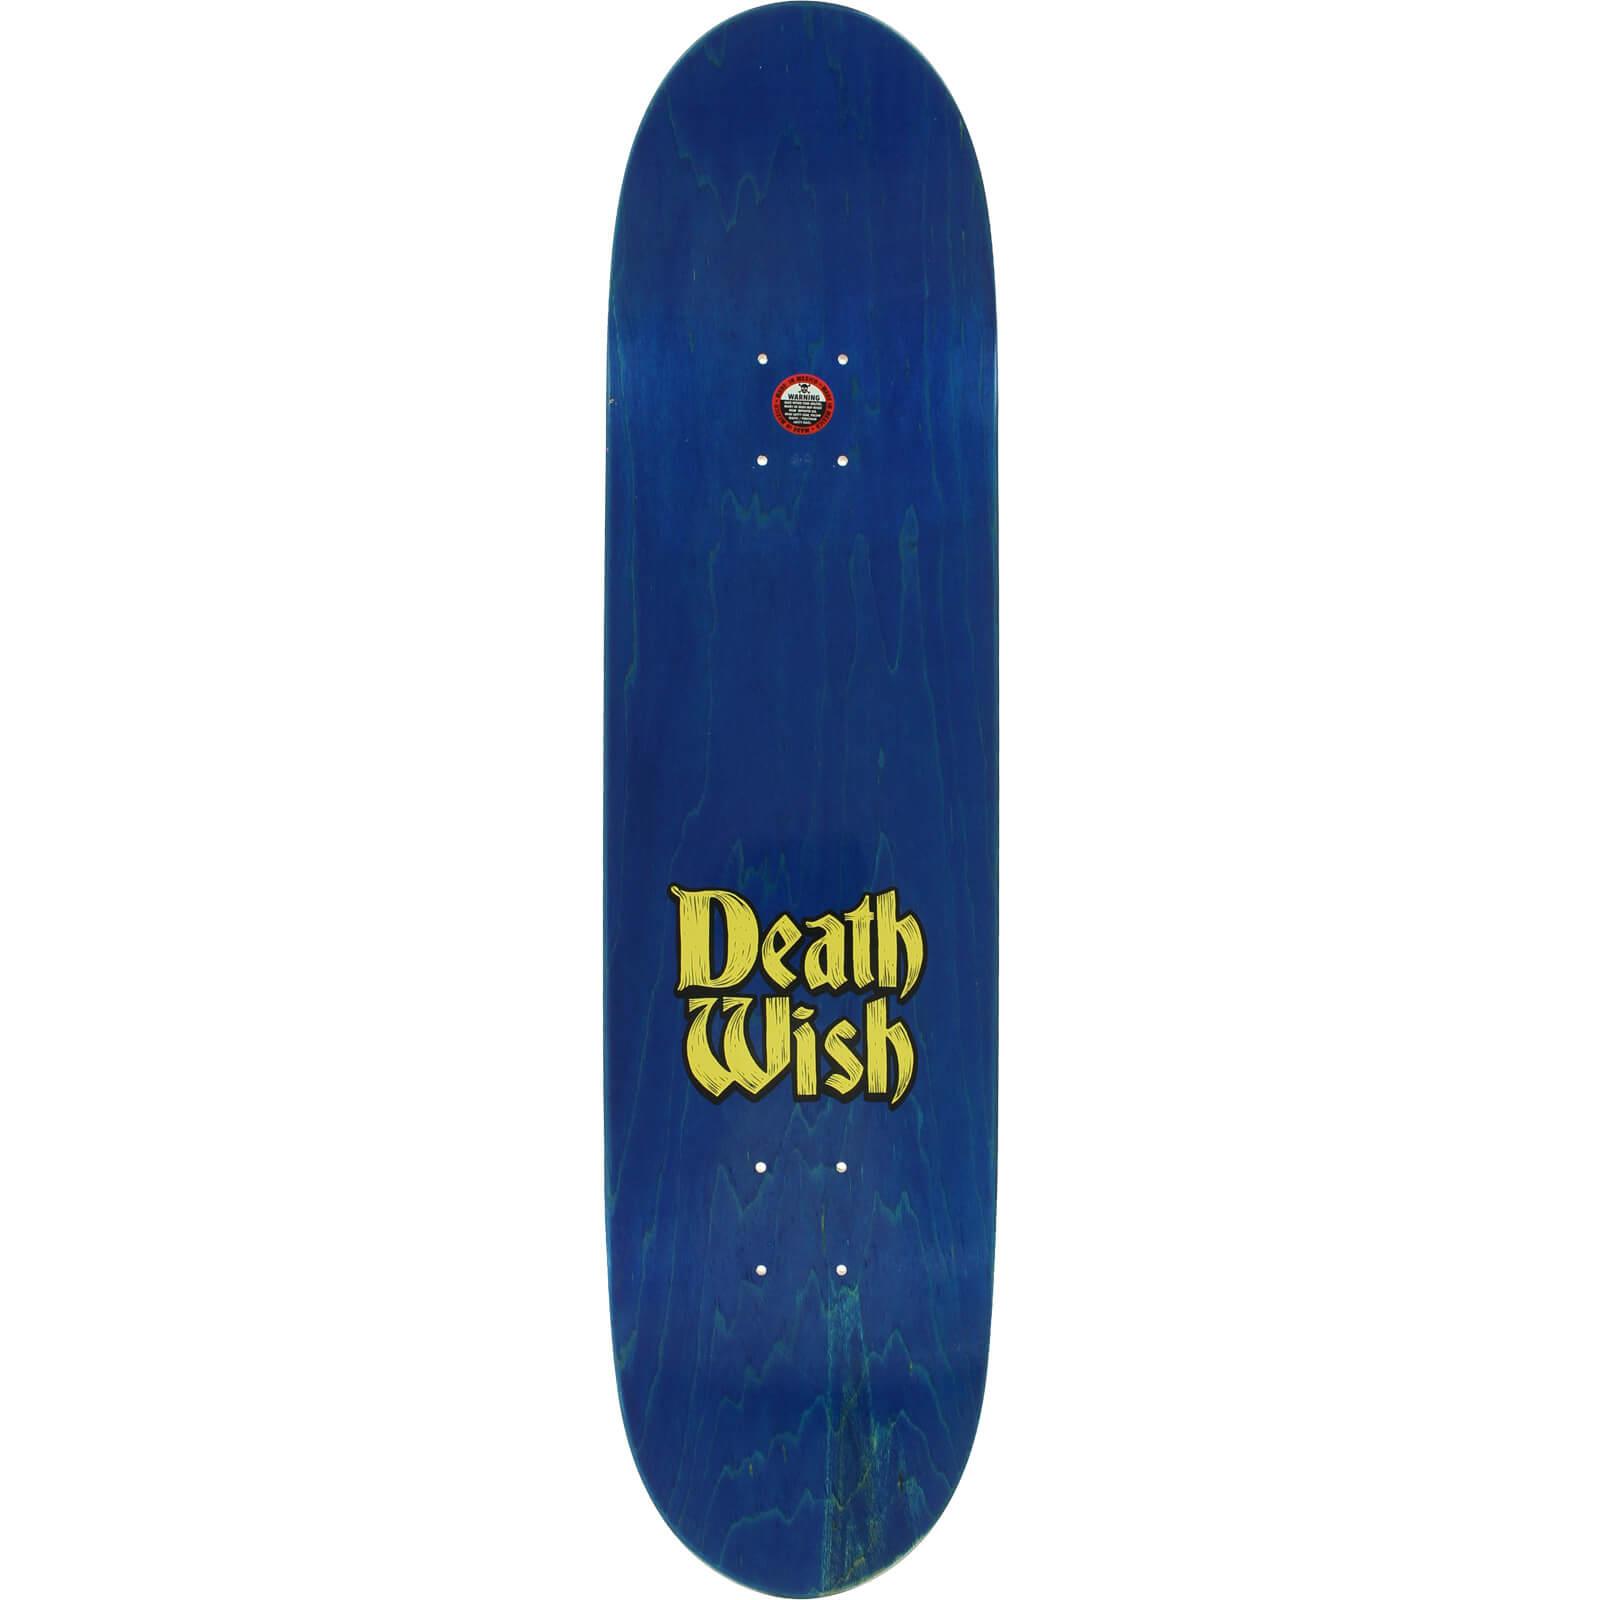 Deathwish Skateboards Jon Dickson Story Time Skateboard